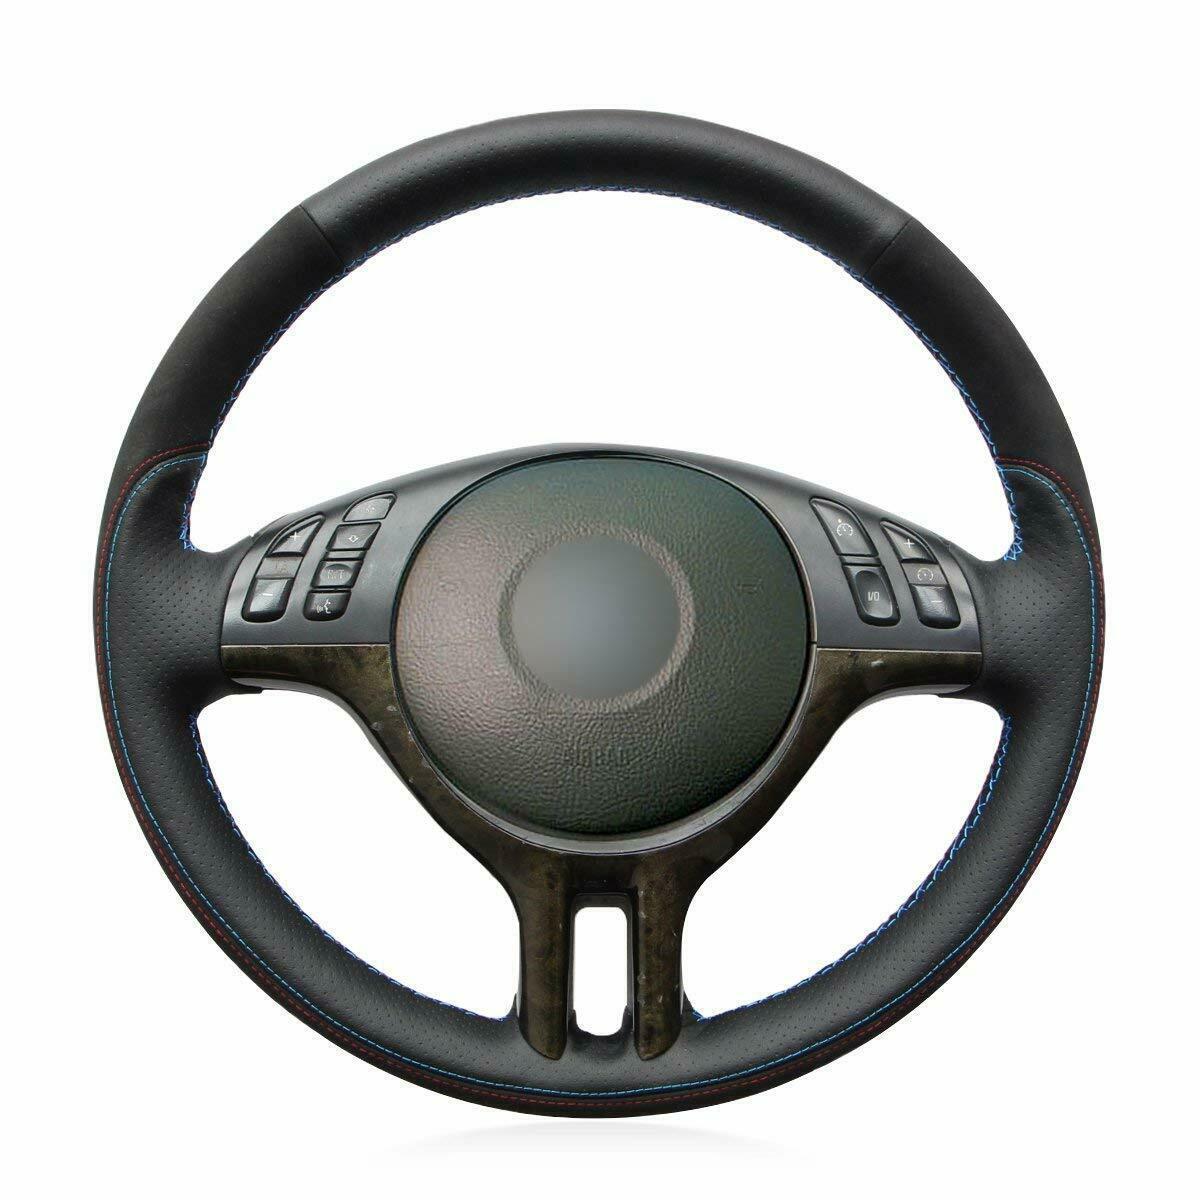 Diy hand sewing Car Steering Wheel Cover for BMW E39 E46 325i E53 X5